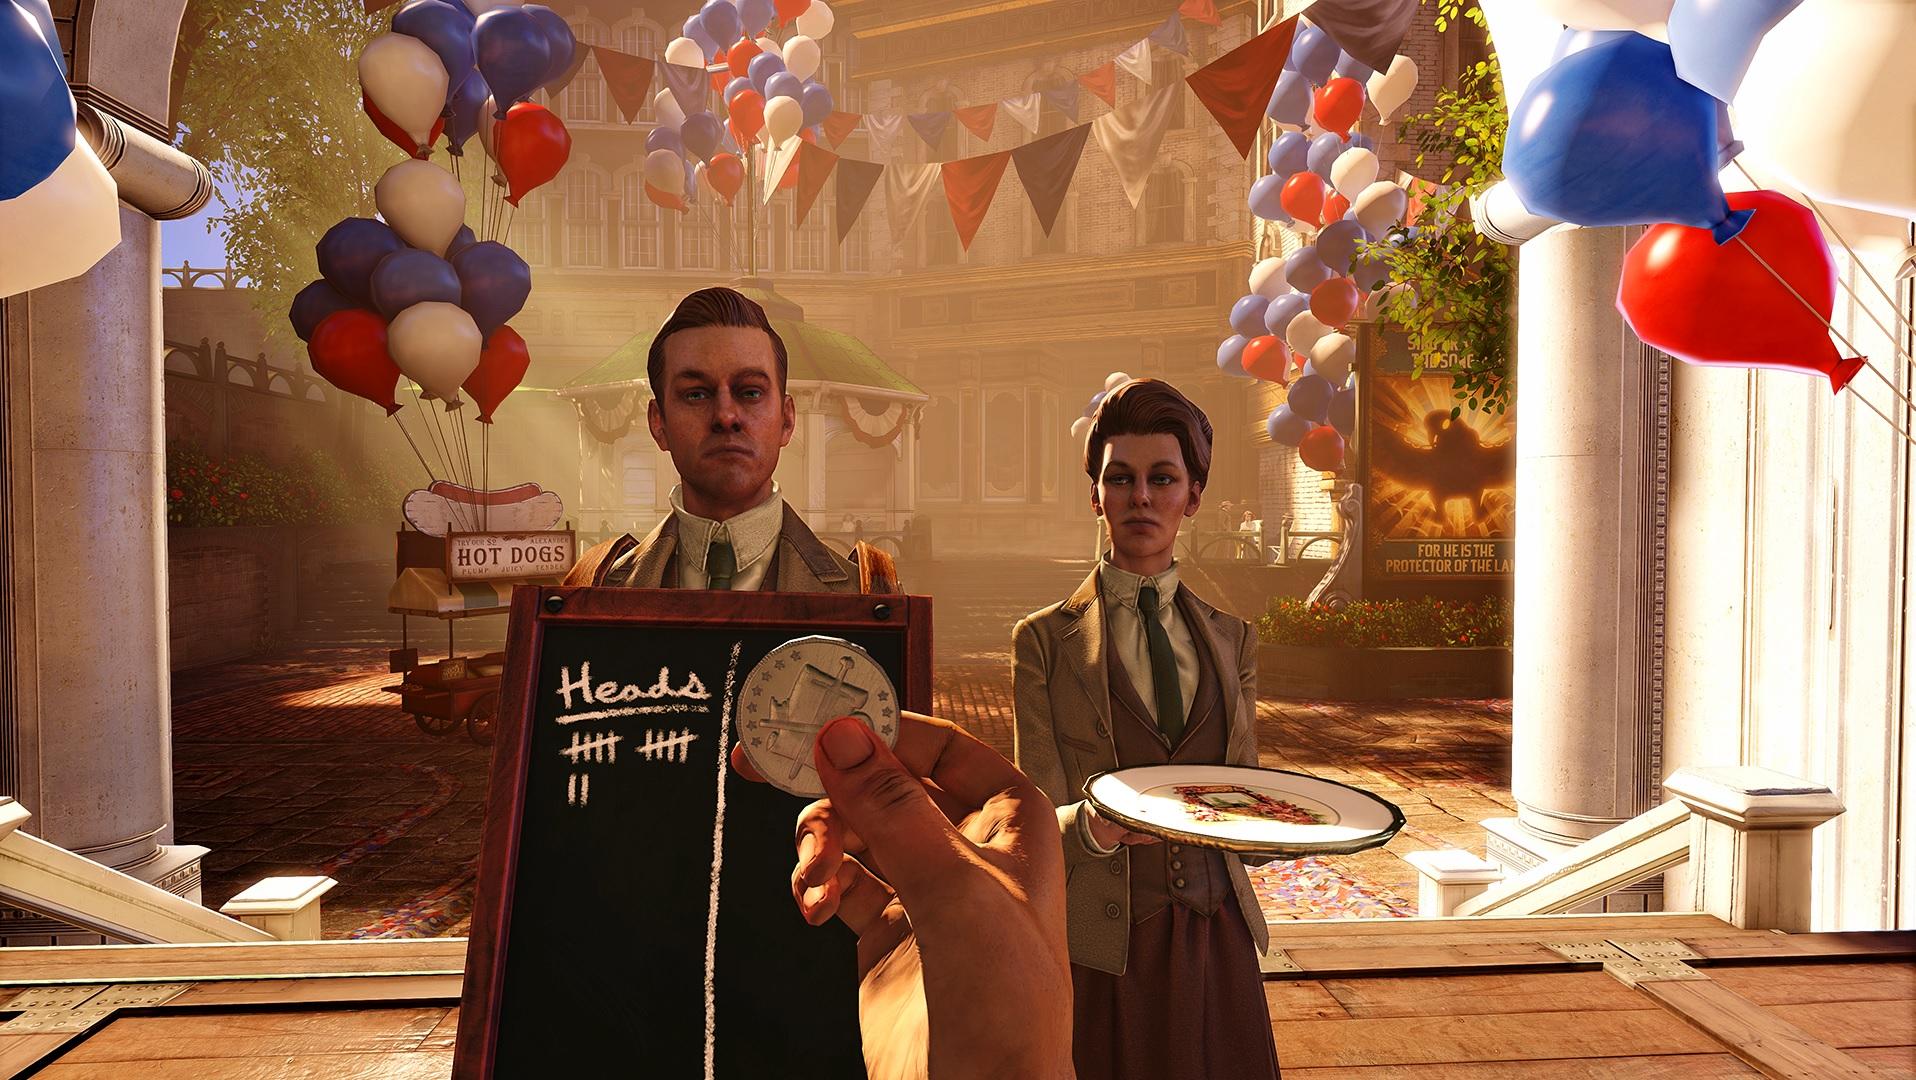 File:Bioshock infinite lutece twins.jpg